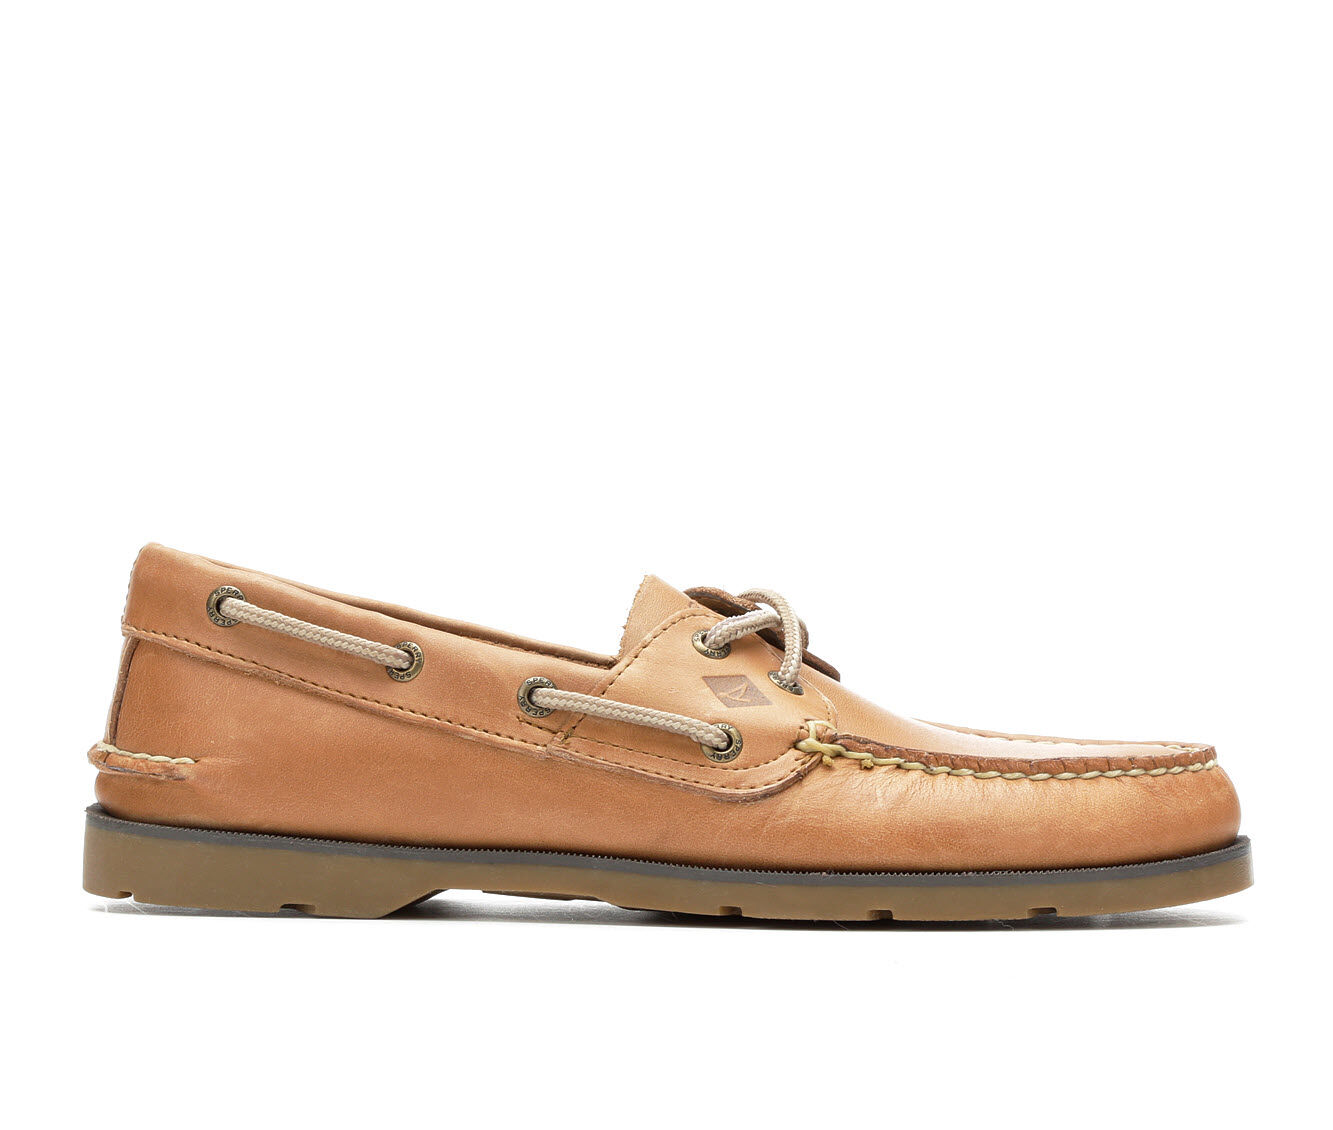 Men's Sperry Leeward 2 Eye Boat Shoes Sahara